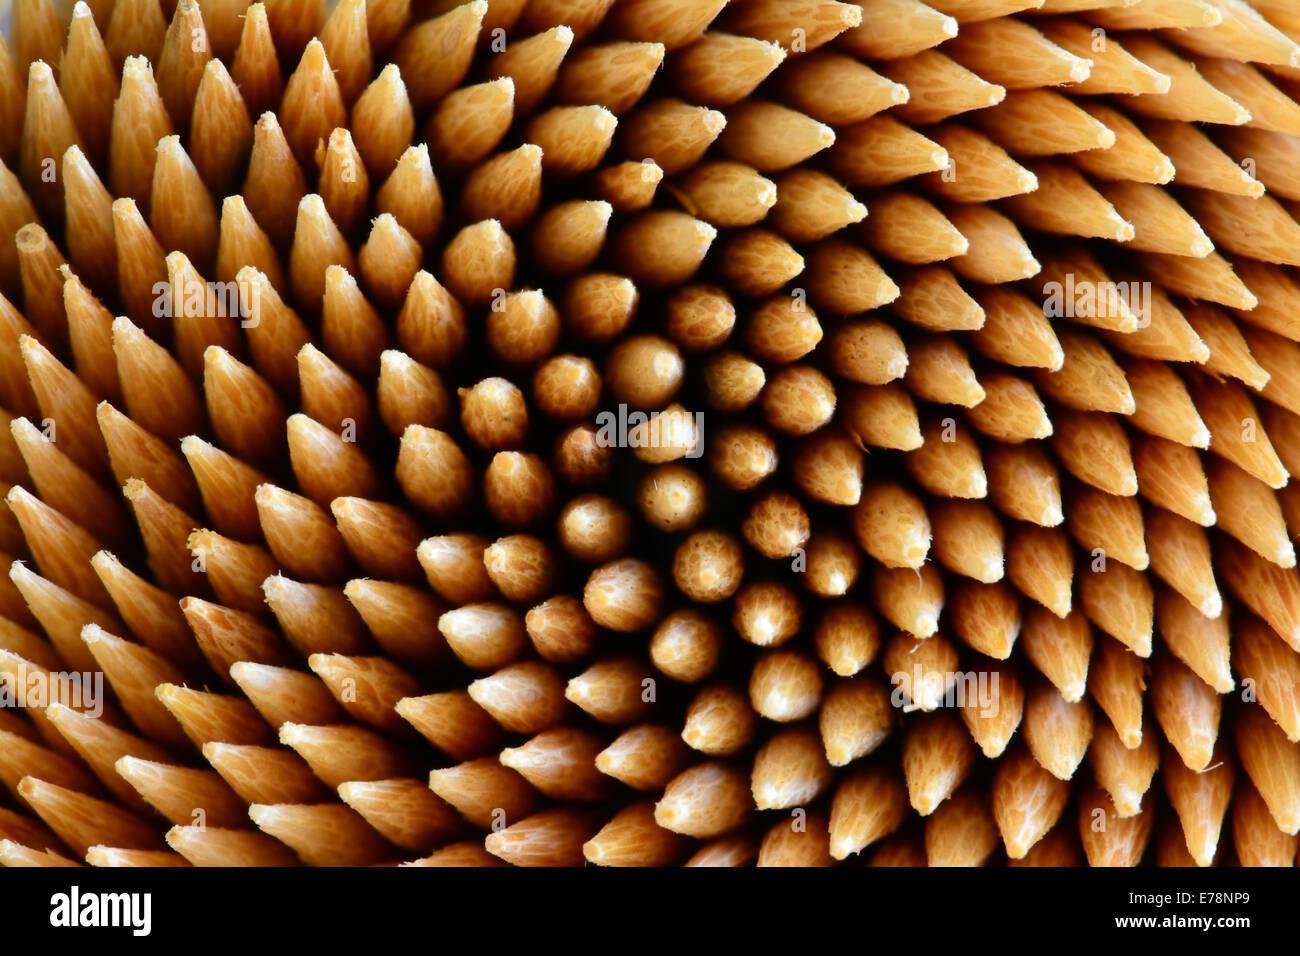 Tooth picks Pattern - Stock Image